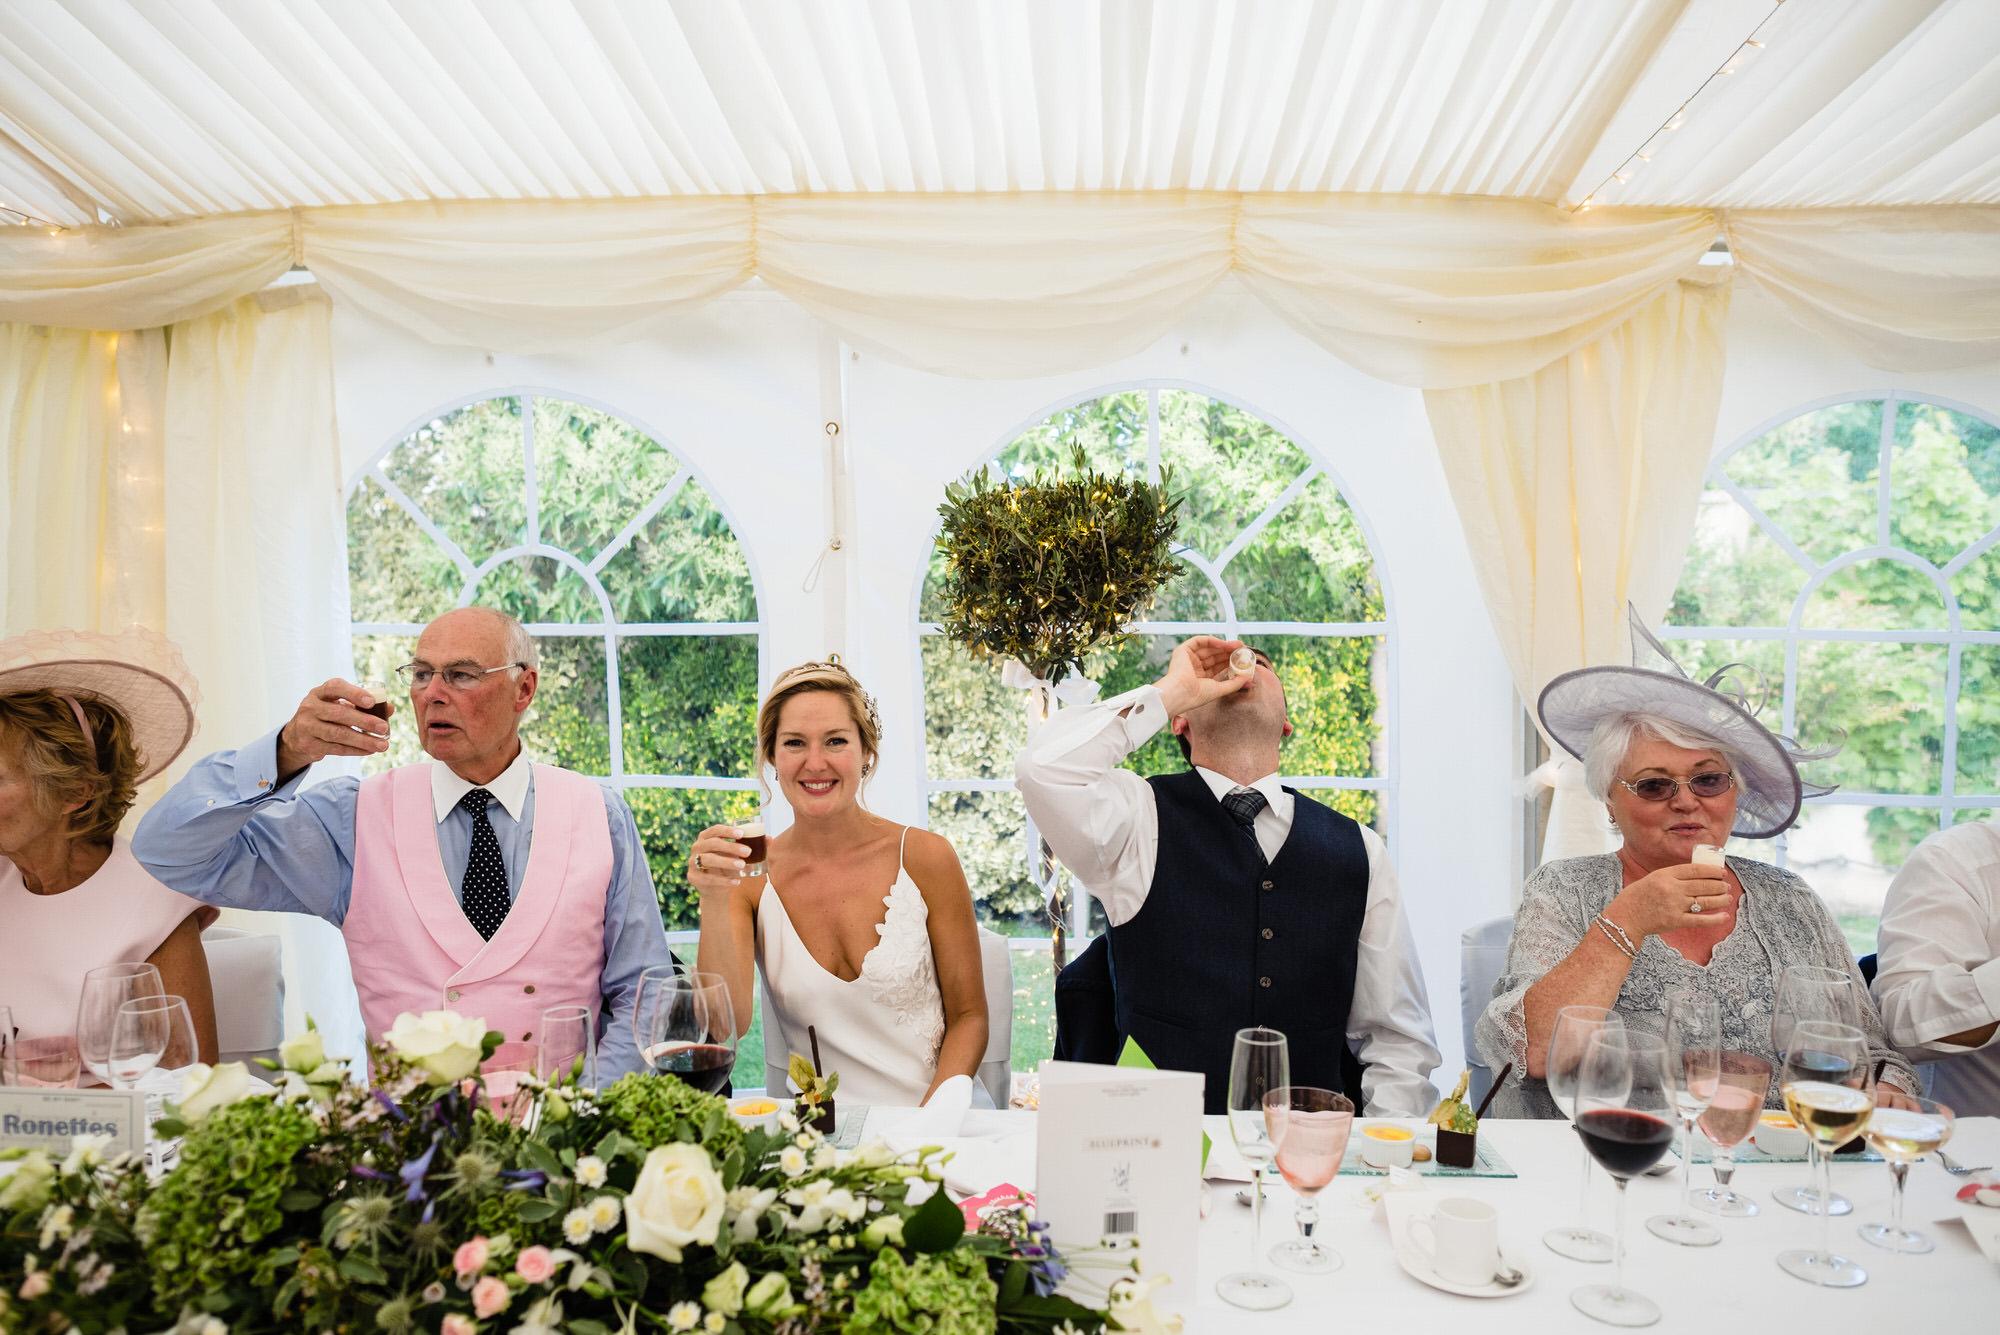 Dorset marquee wedding by the sea simon biffen photography 41